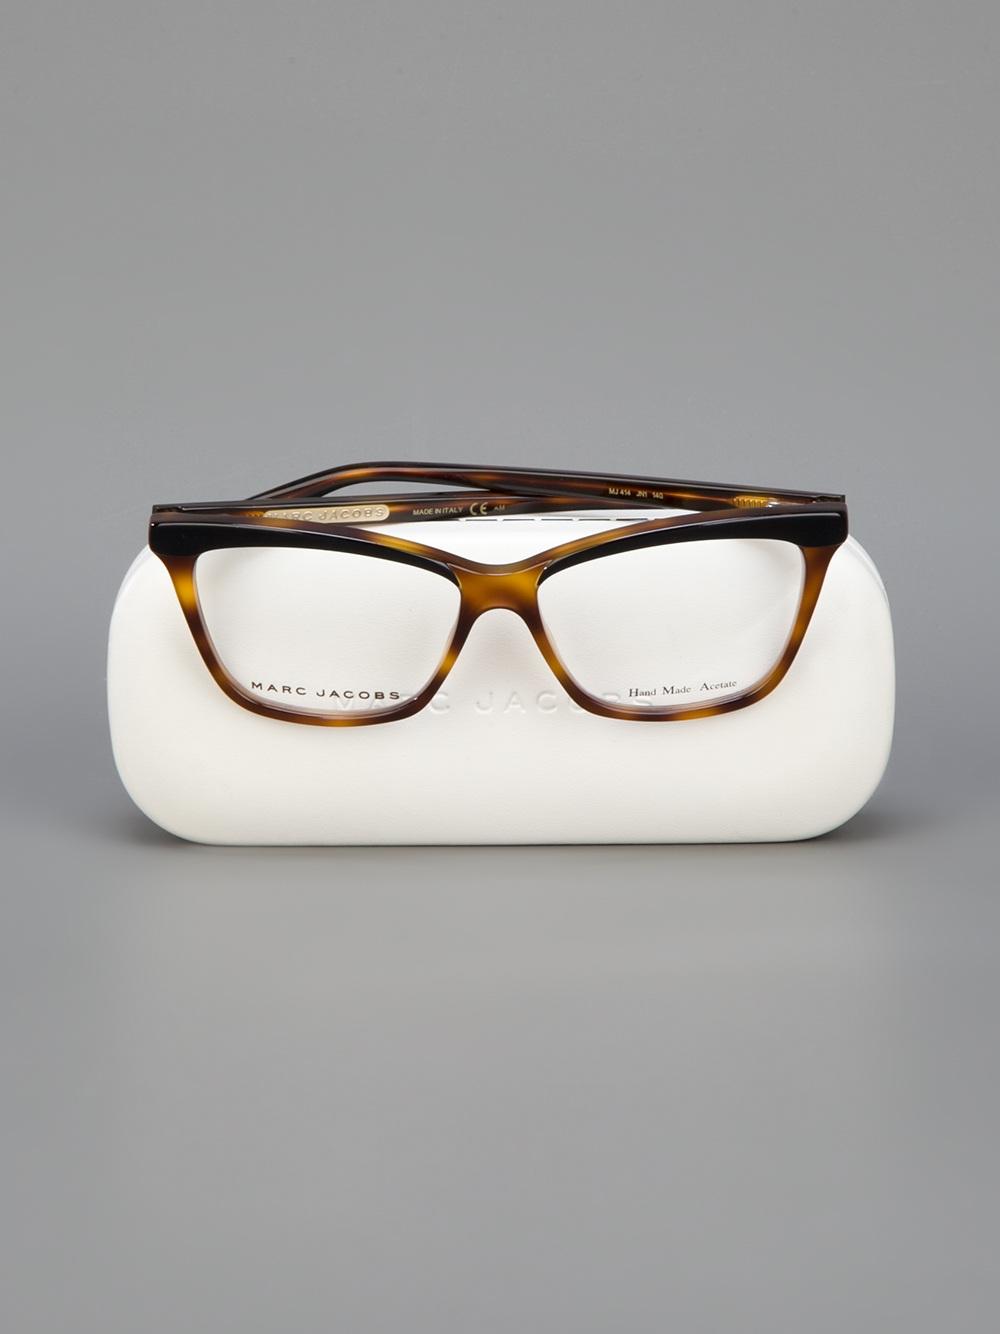 Lyst - Marc Jacobs Tortoise Shell Wayfarer Glasses in Brown